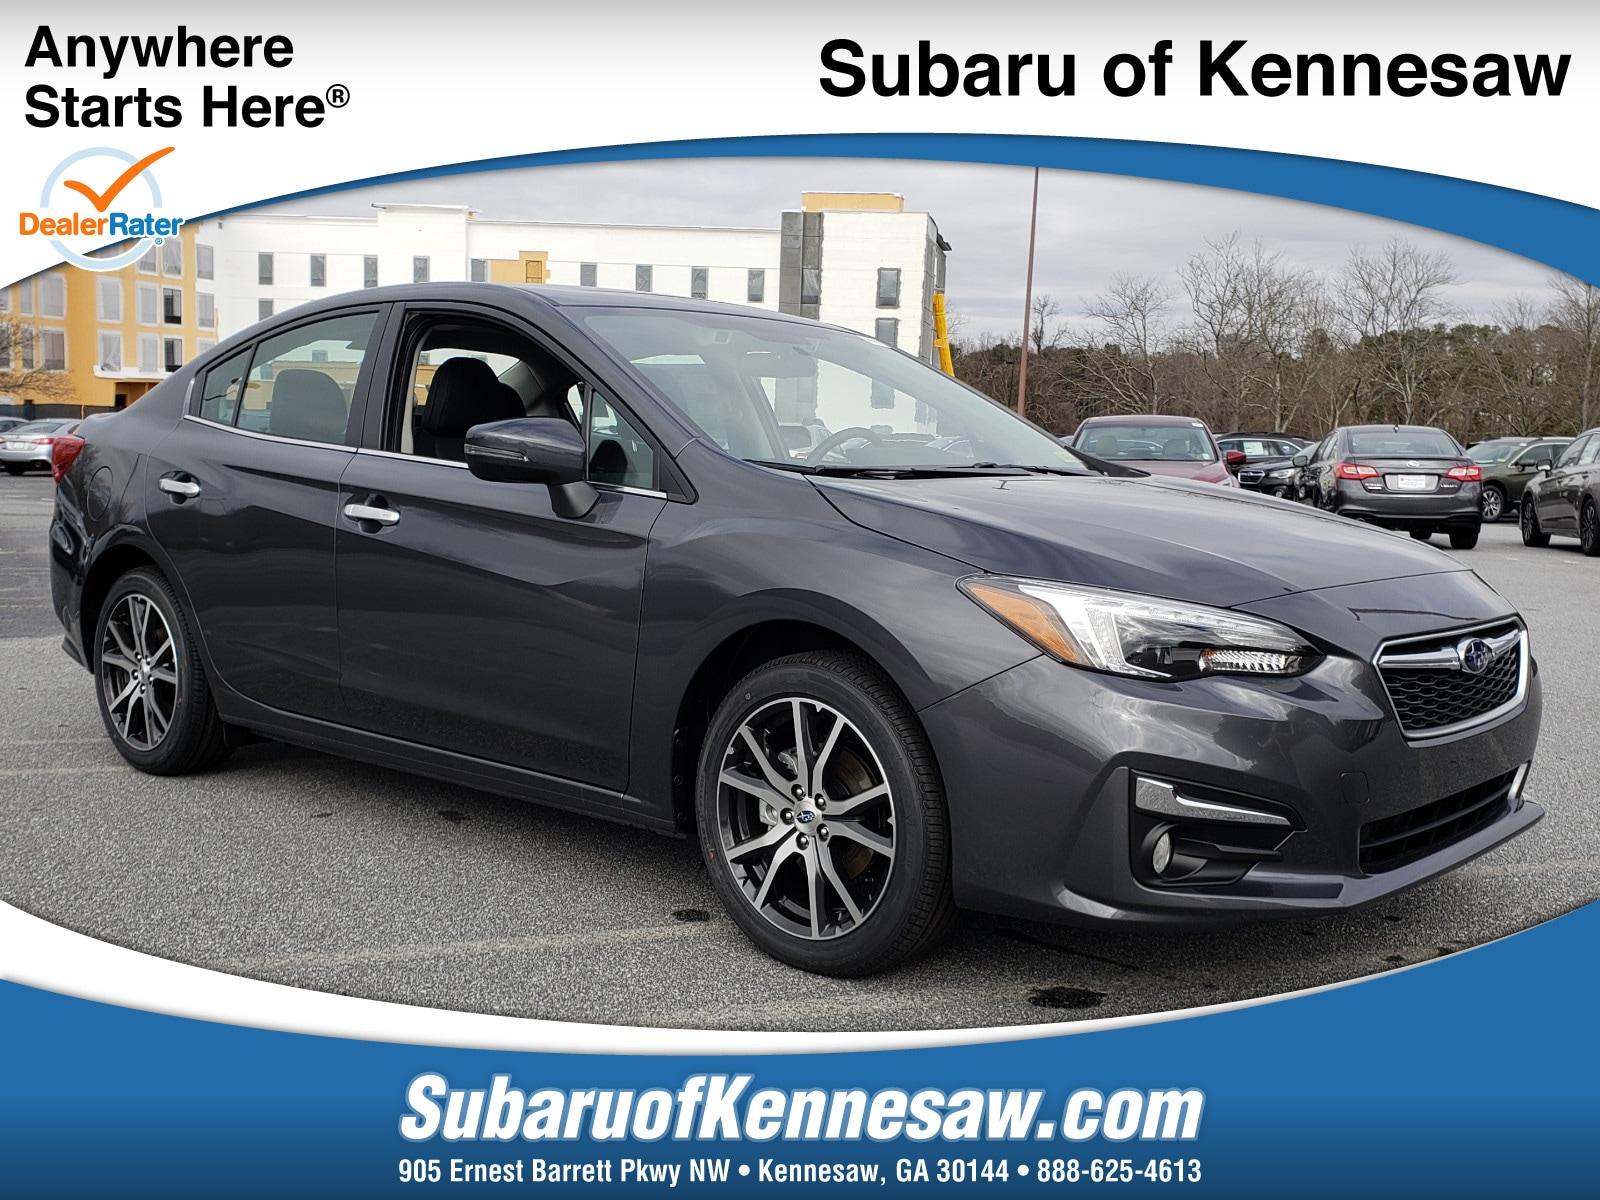 New 2019 Subaru Impreza 2.0i Limited Sedan in Kennesaw GA